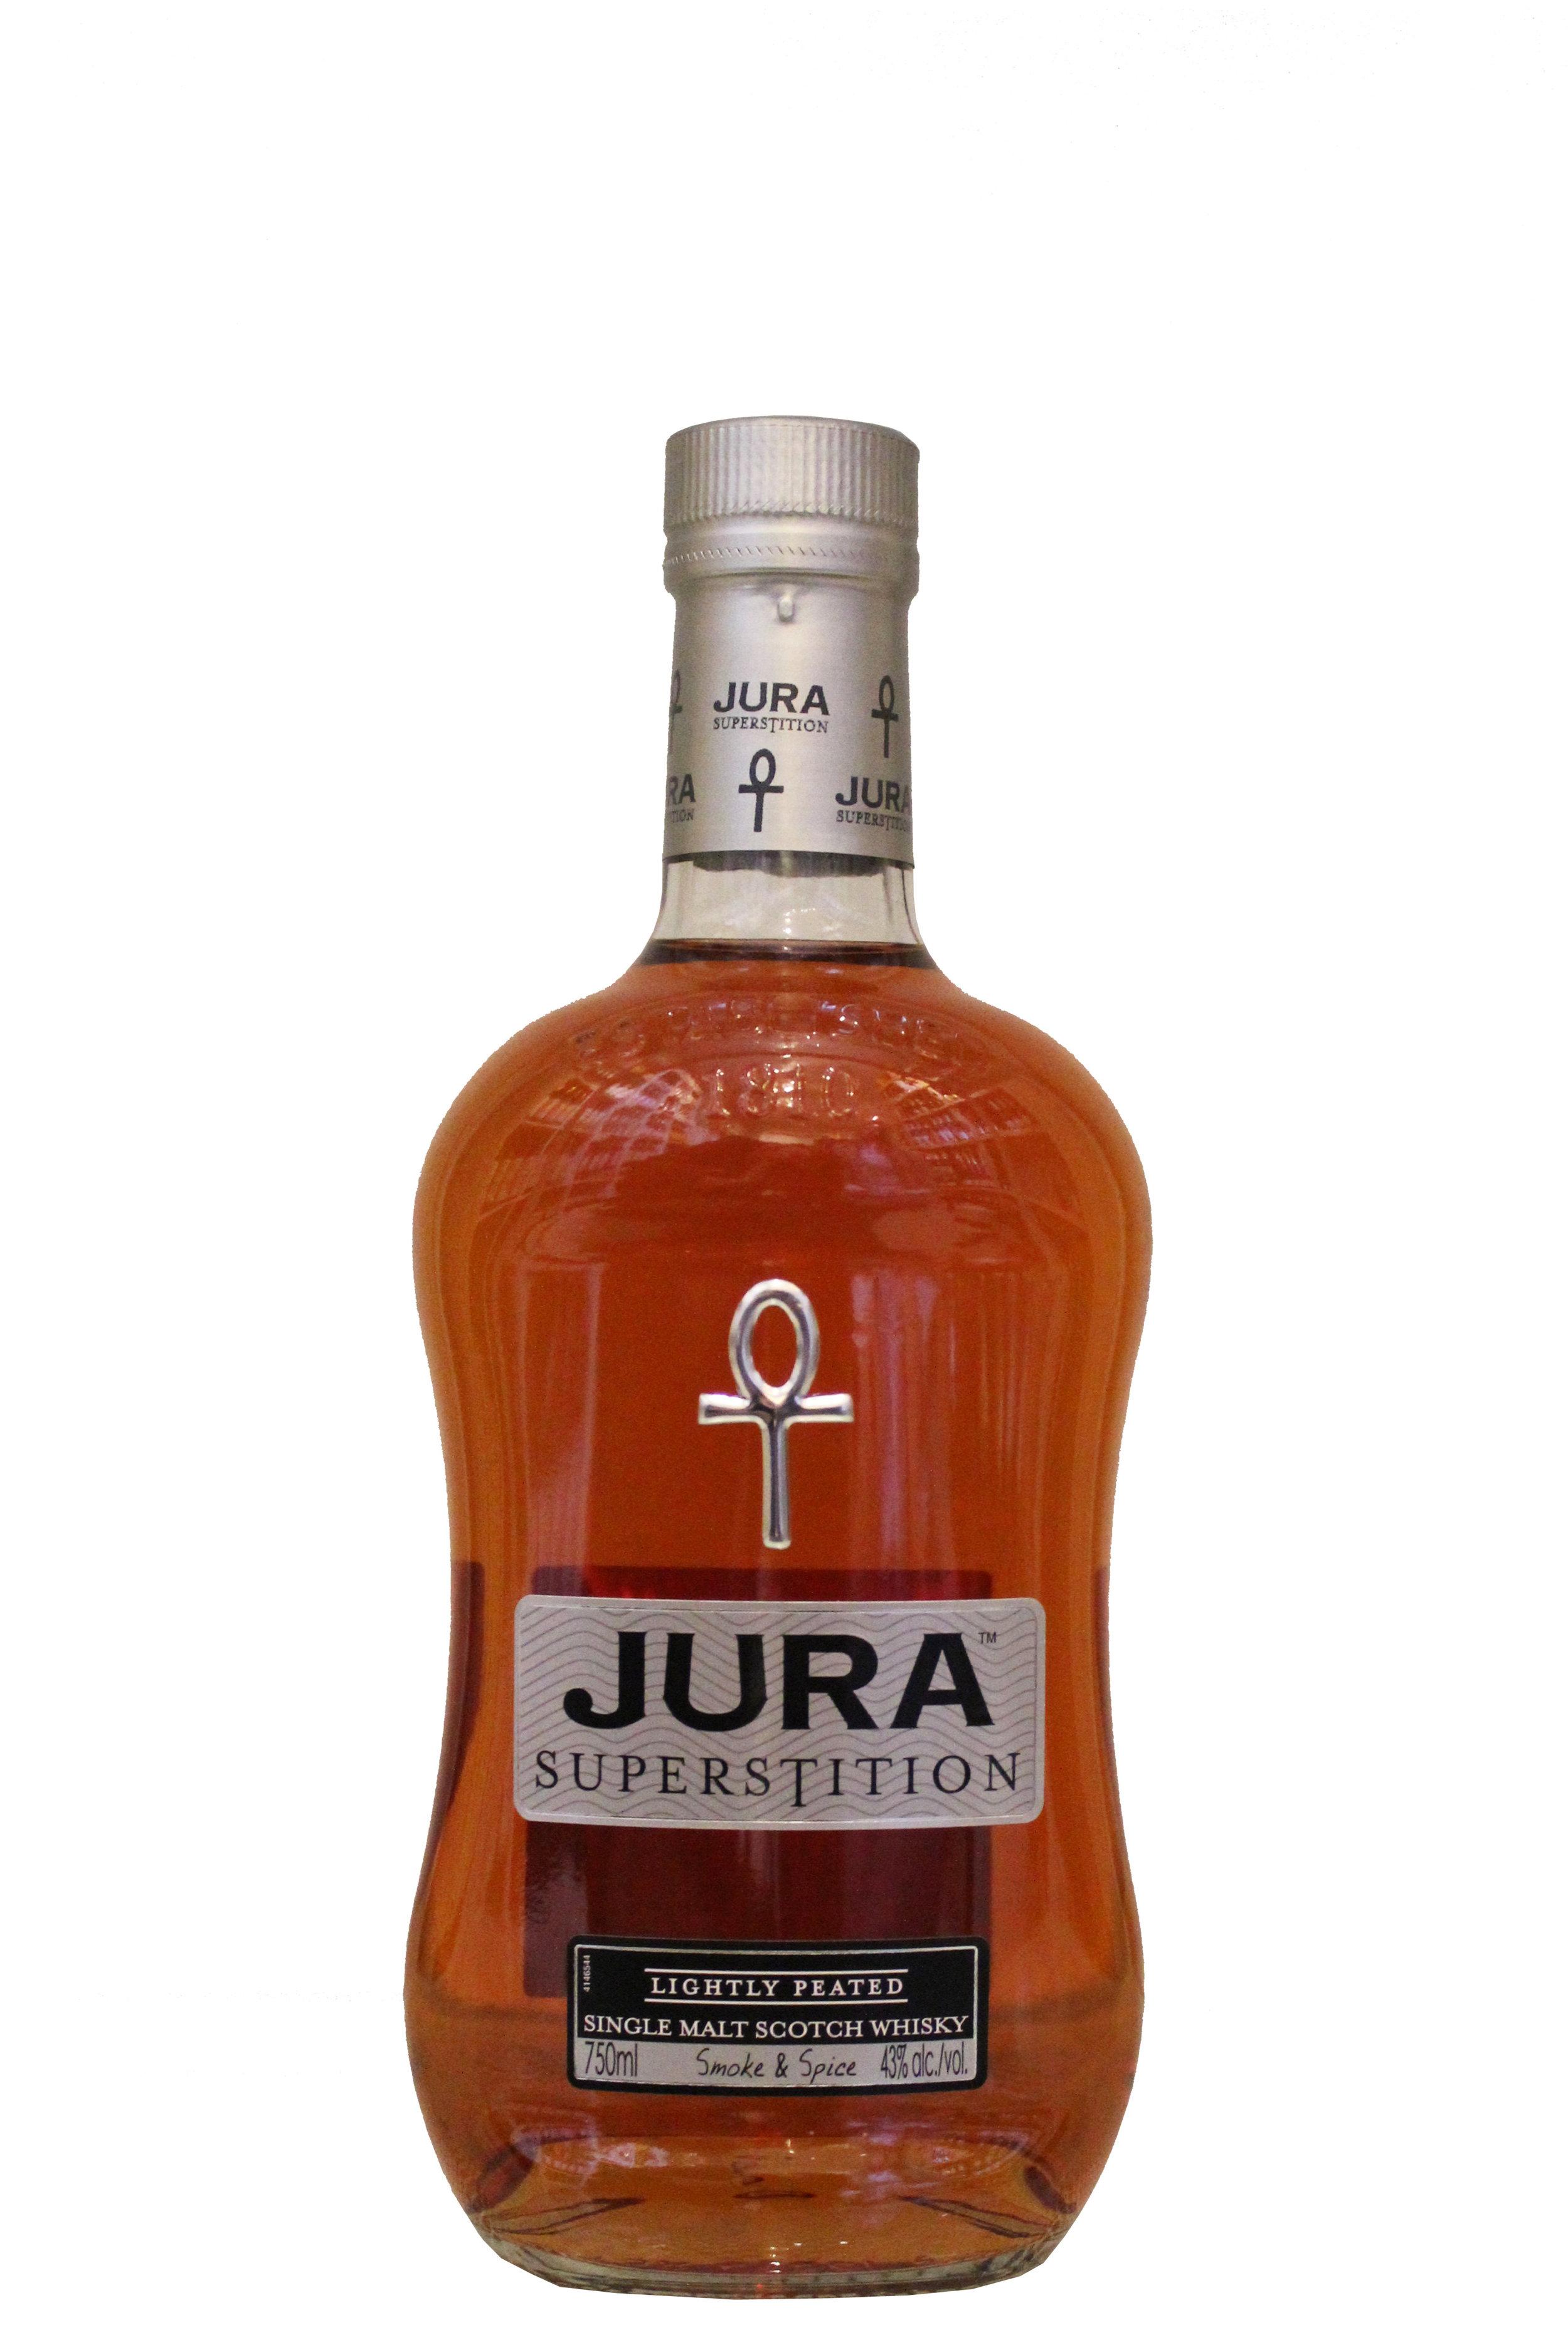 Single Malt Scotch Whiskey  Jura Superstition, Scotland